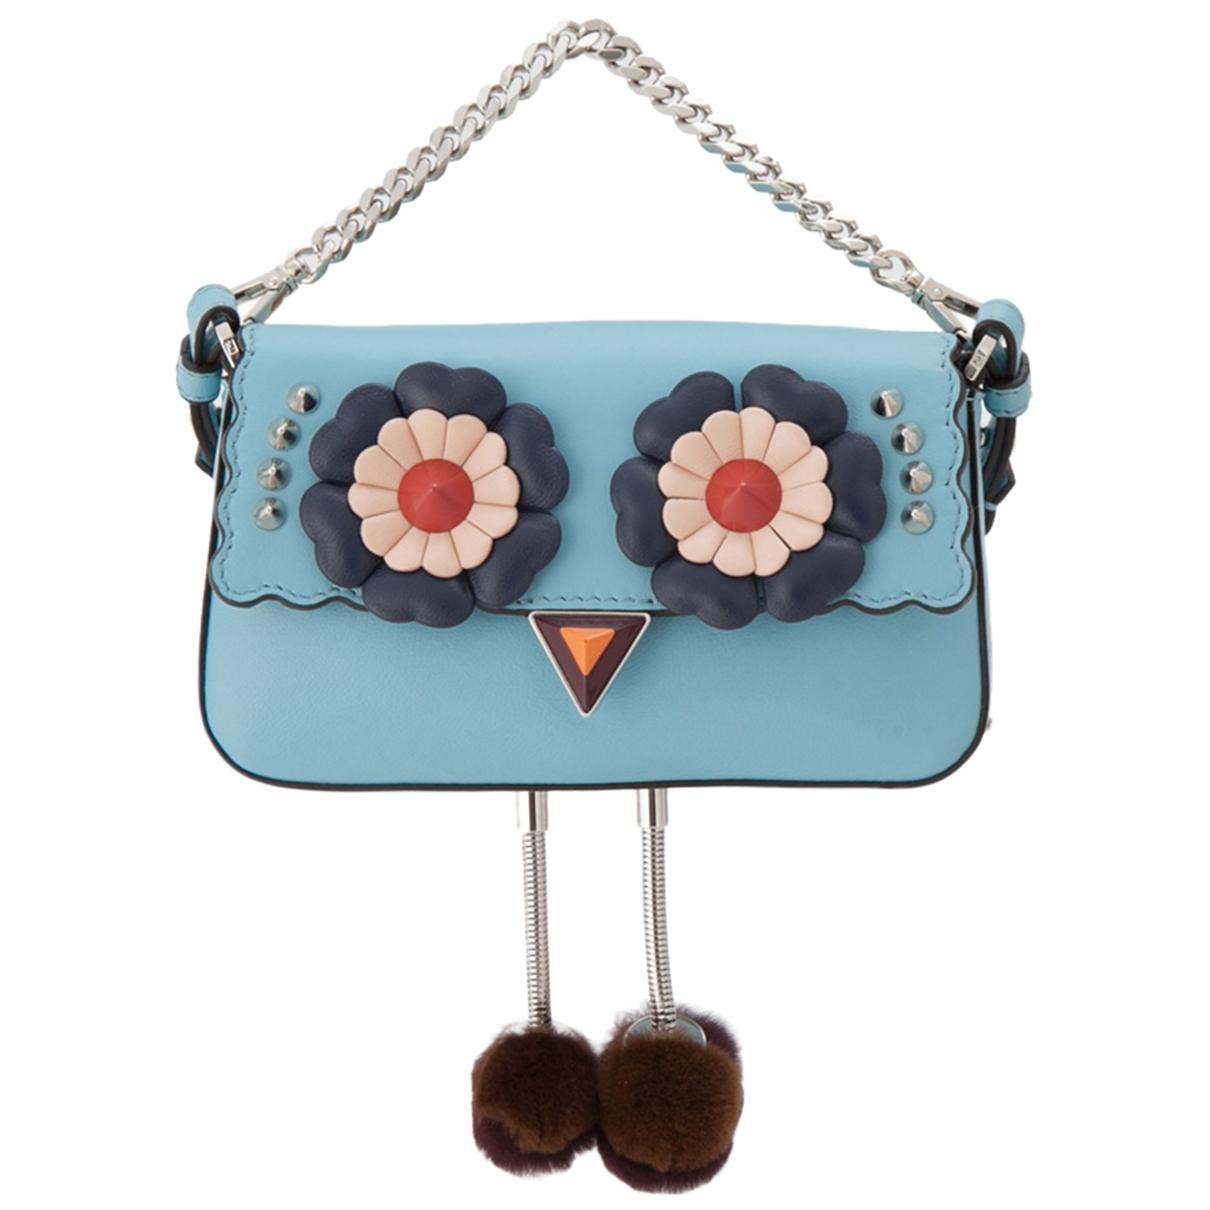 Fendi \N Blue Leather Clutch bag for Women 33 IT